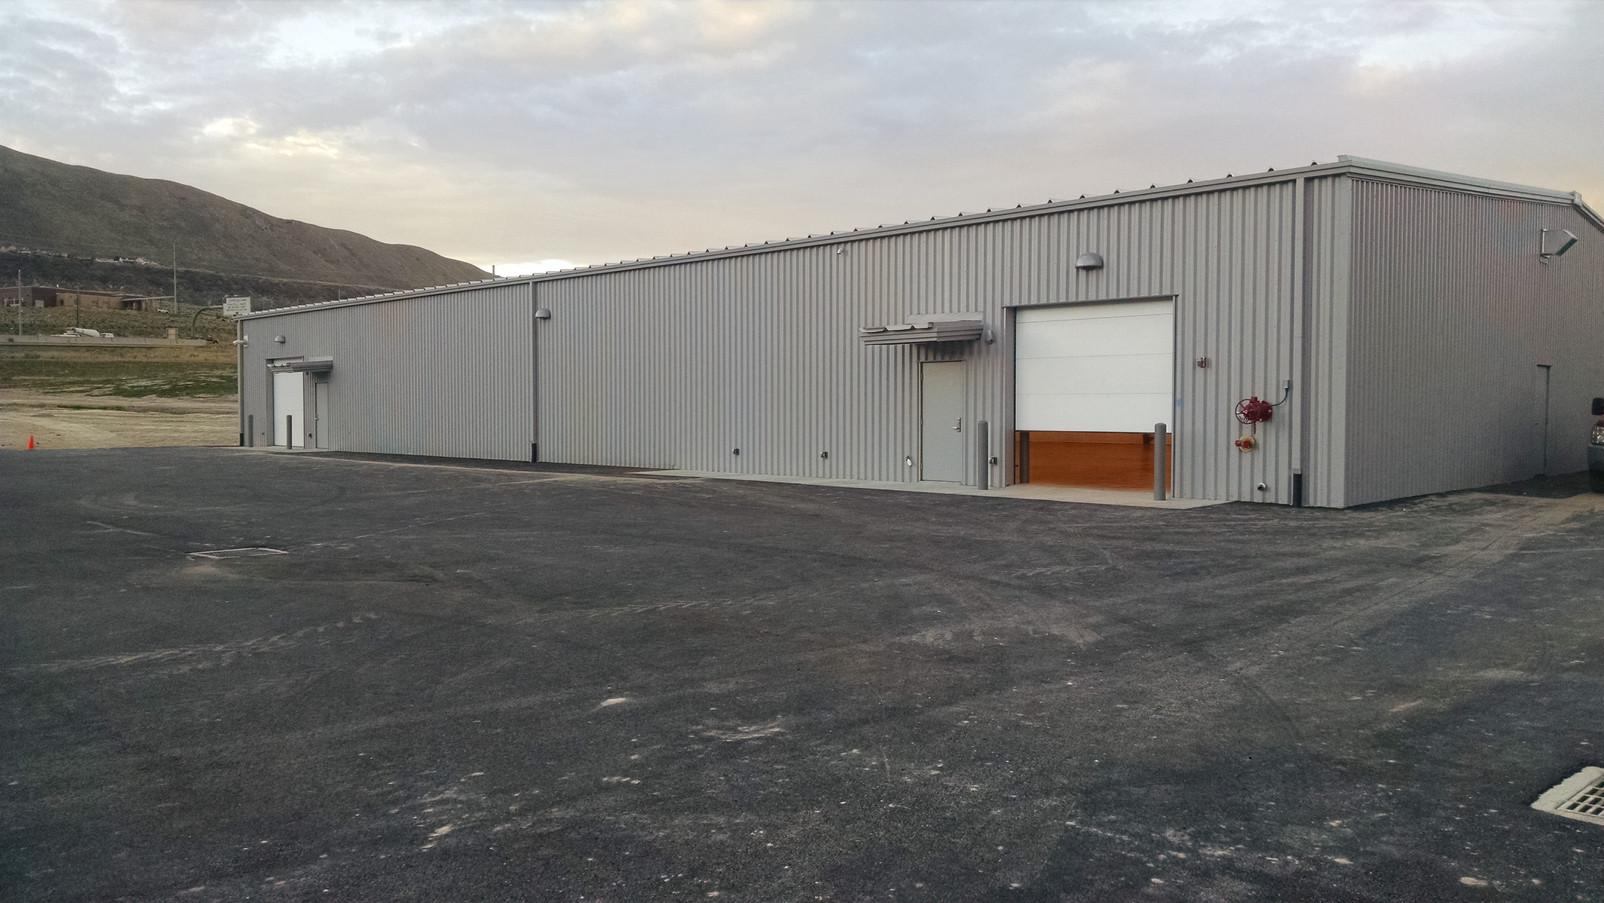 Northern Utah Interagency Fire Cache Building